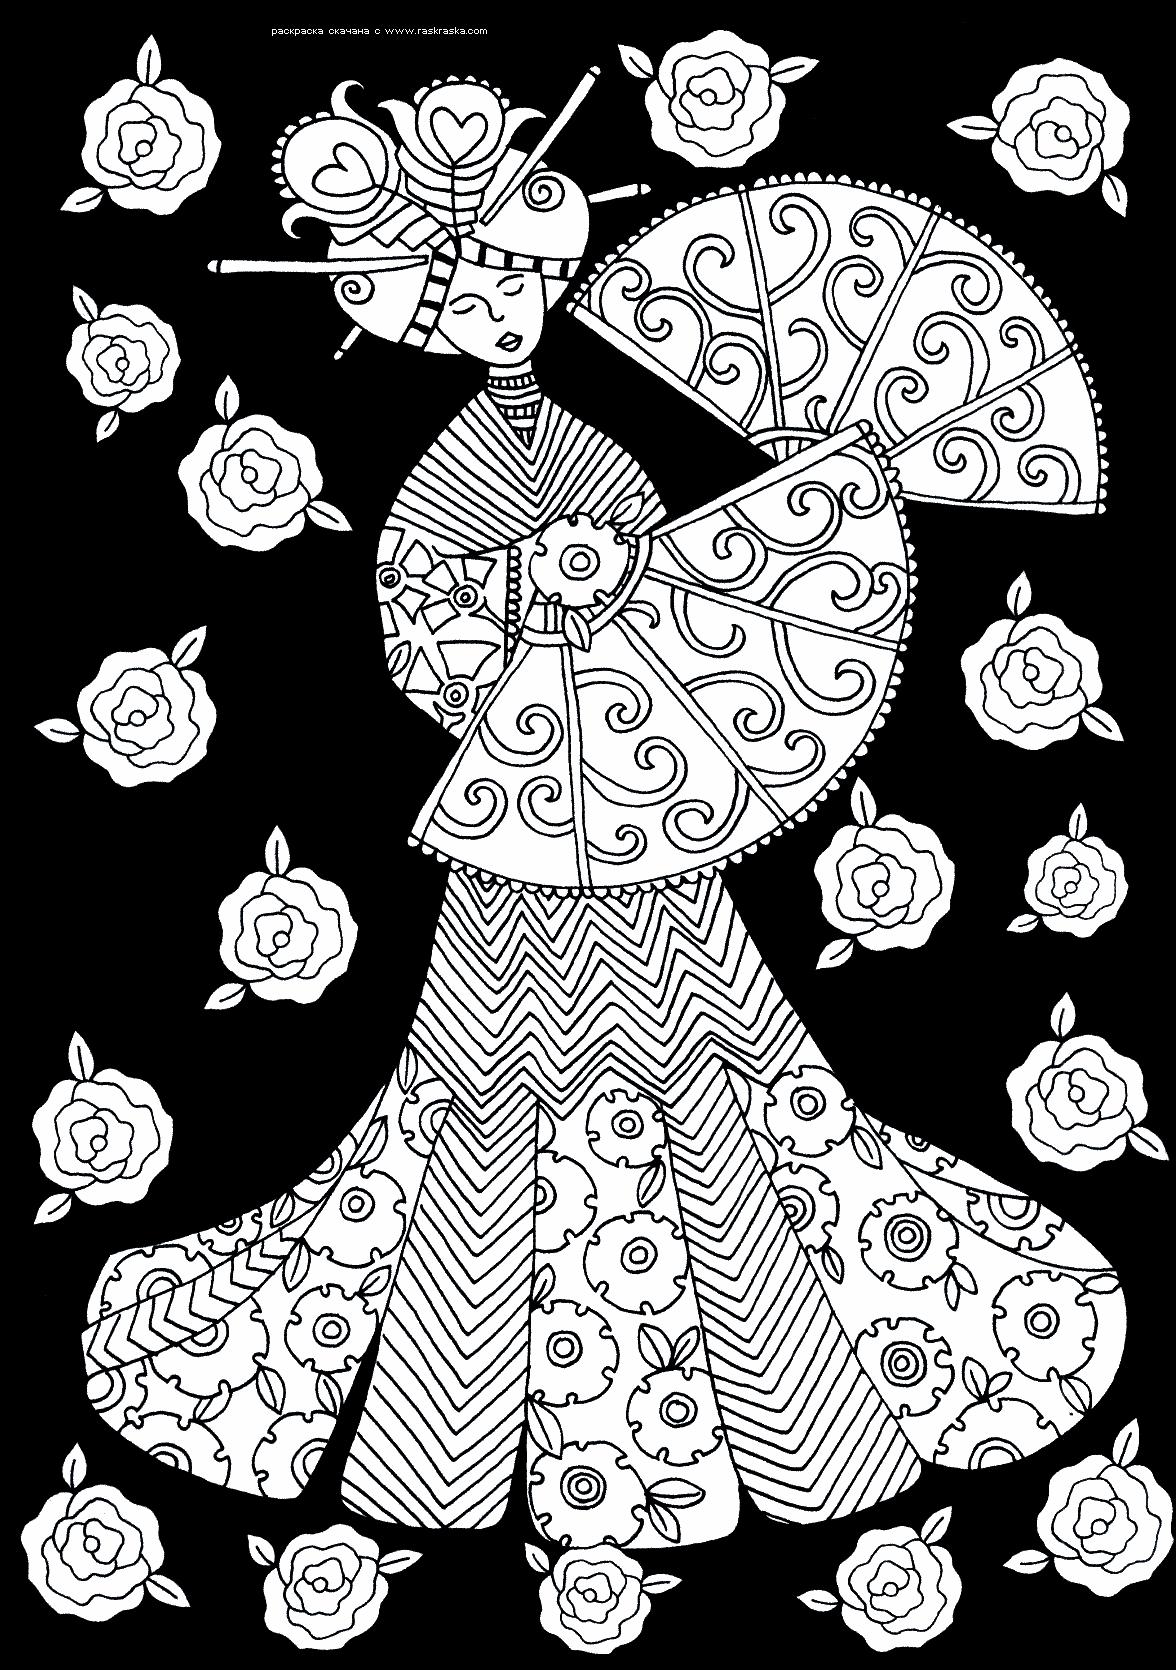 Раскраска Девушка с веером | Раскраски антистресс Девушки ...